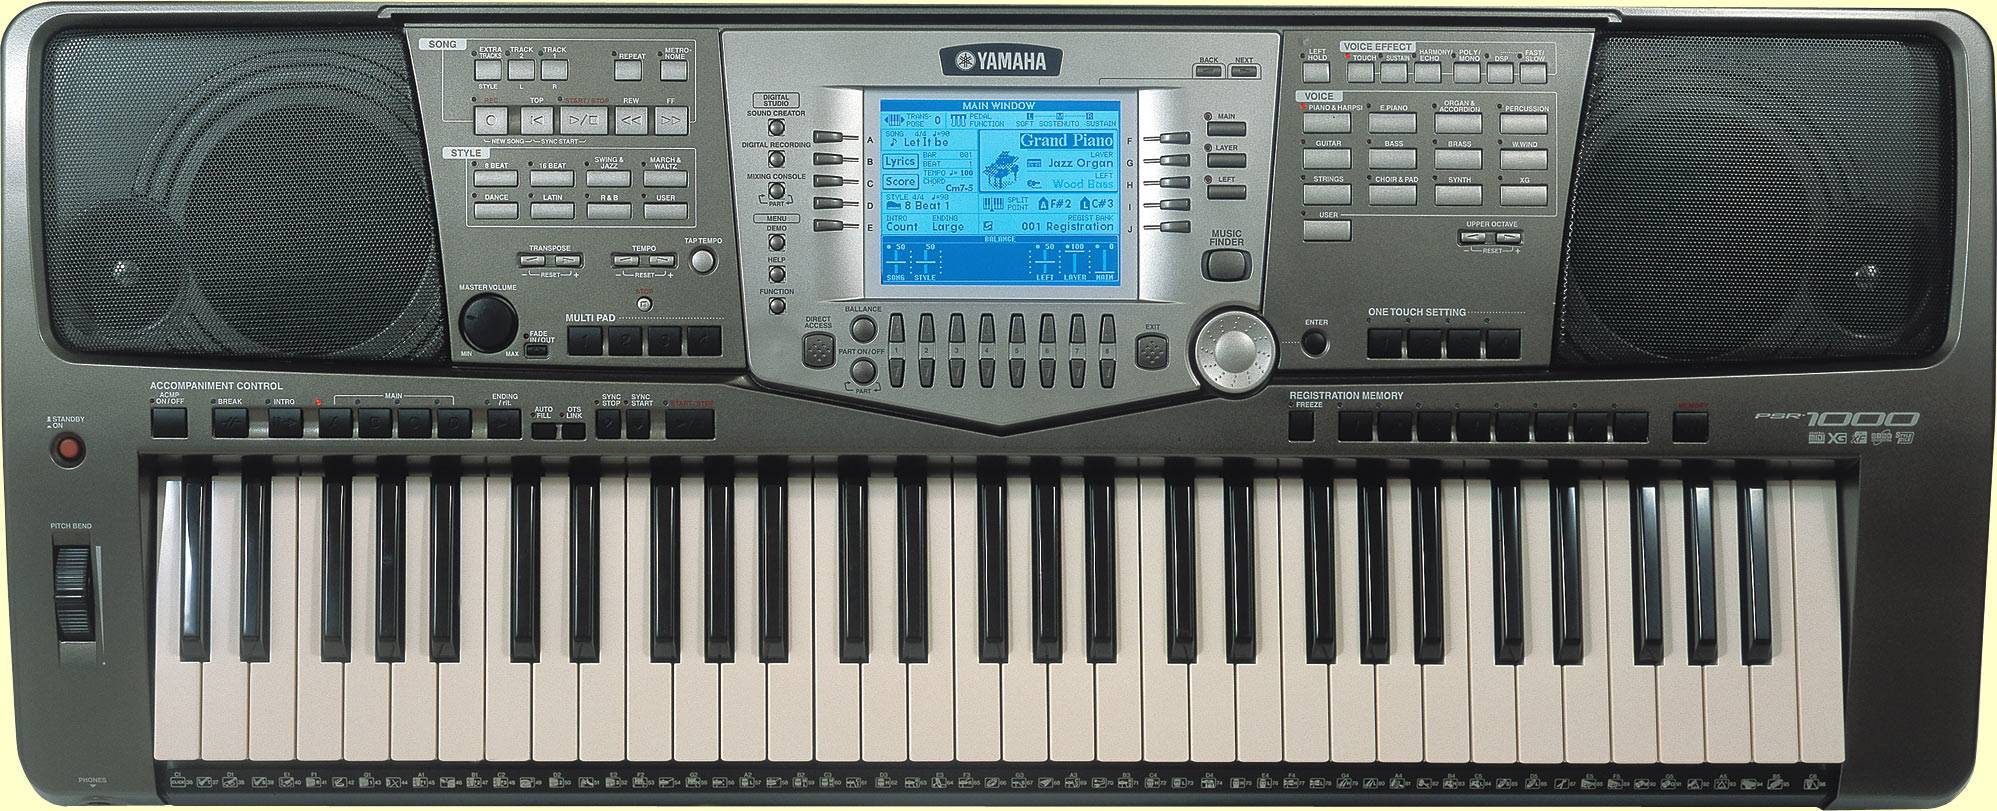 yamaha psr keyboard buyer importer ecplaza net rh ecplaza net Yamaha PSR S550 Yamaha PSR S550